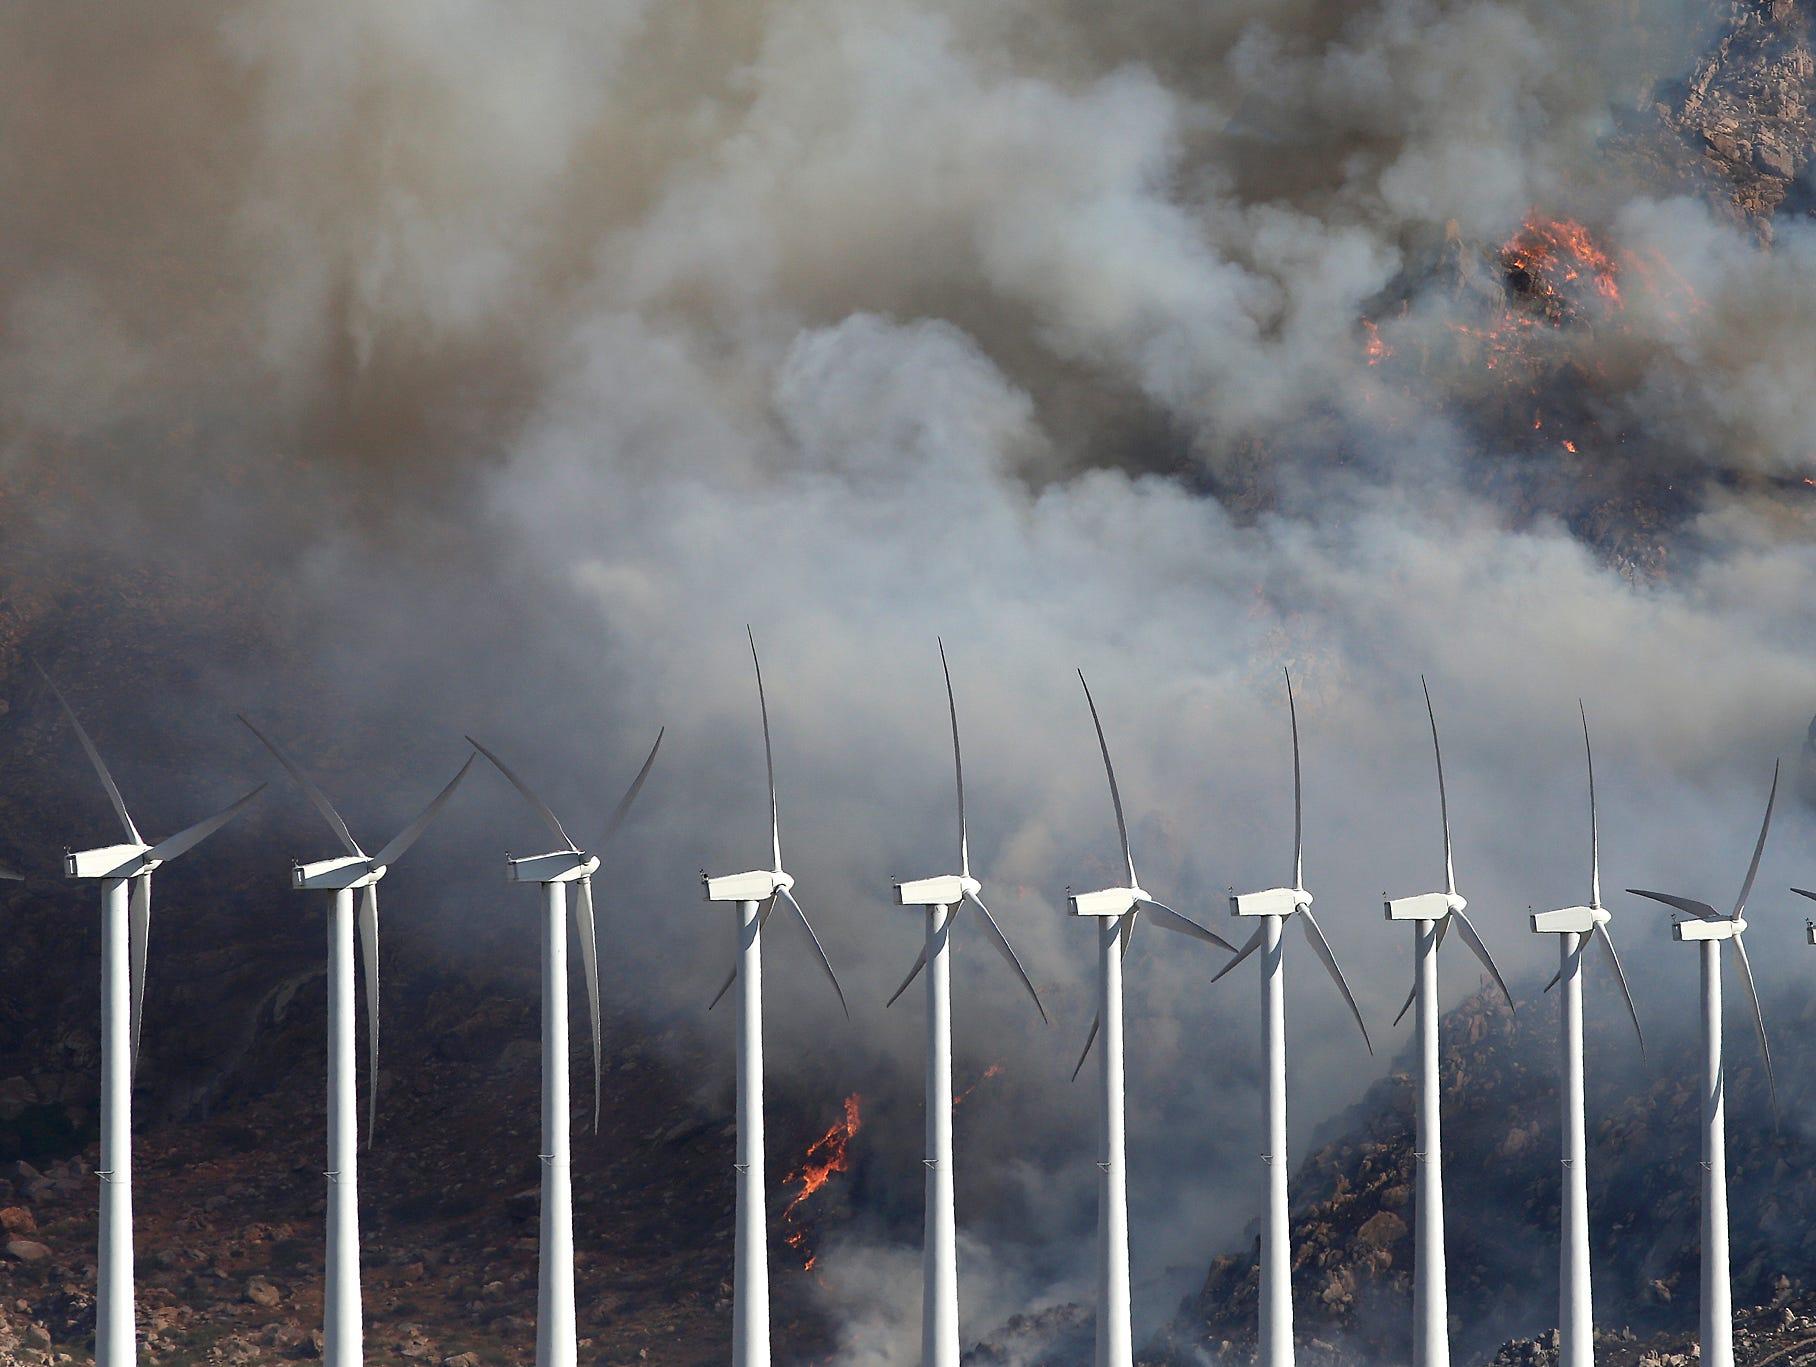 A wildfire burns near wind turbines near Cabazon.